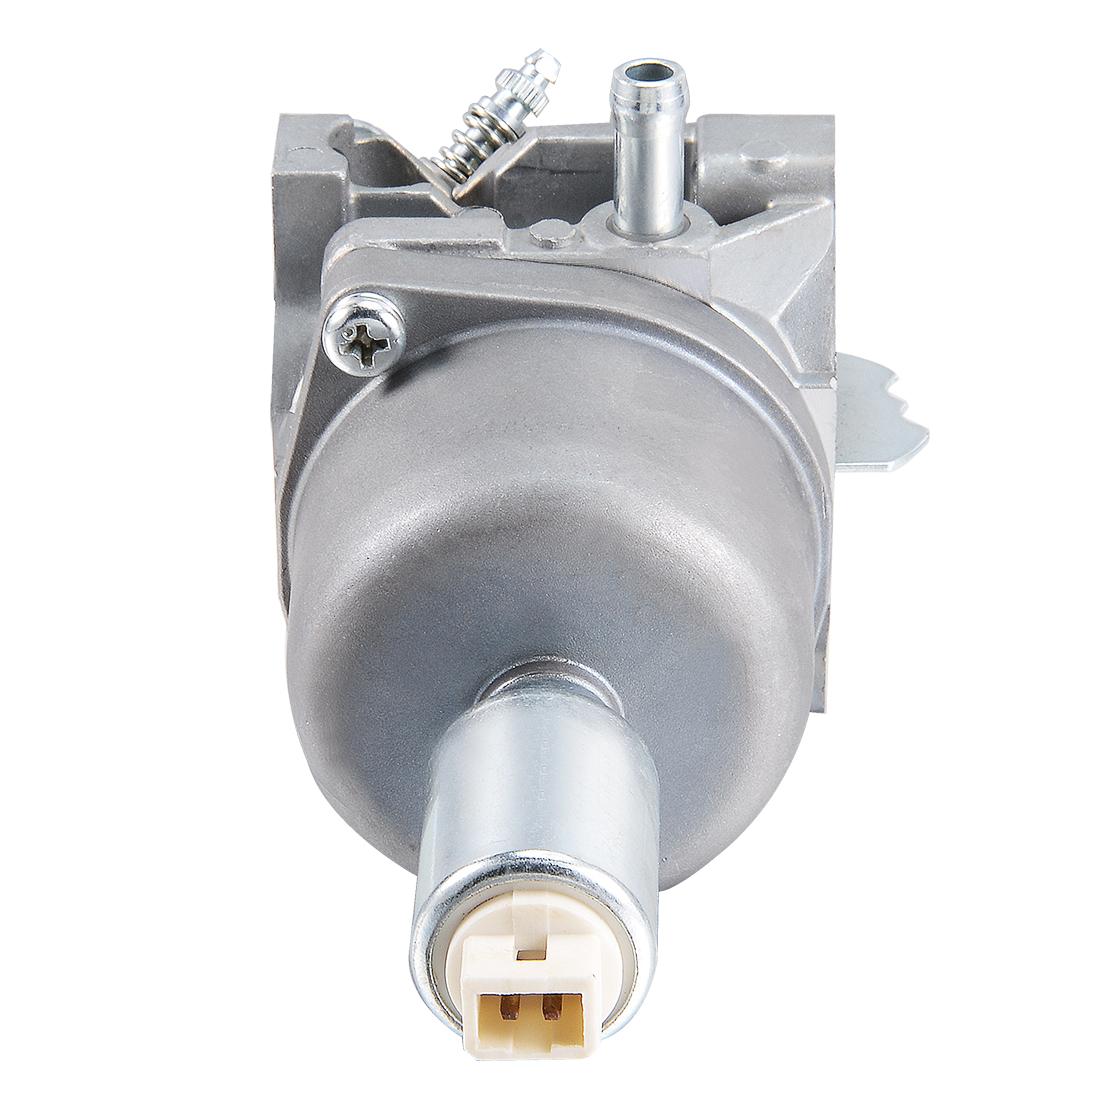 Unique Bargains Carburetor Kit Replaces Briggs & Stratton 794572 791858 792358 Intek 14HP 18HP - image 1 of 7